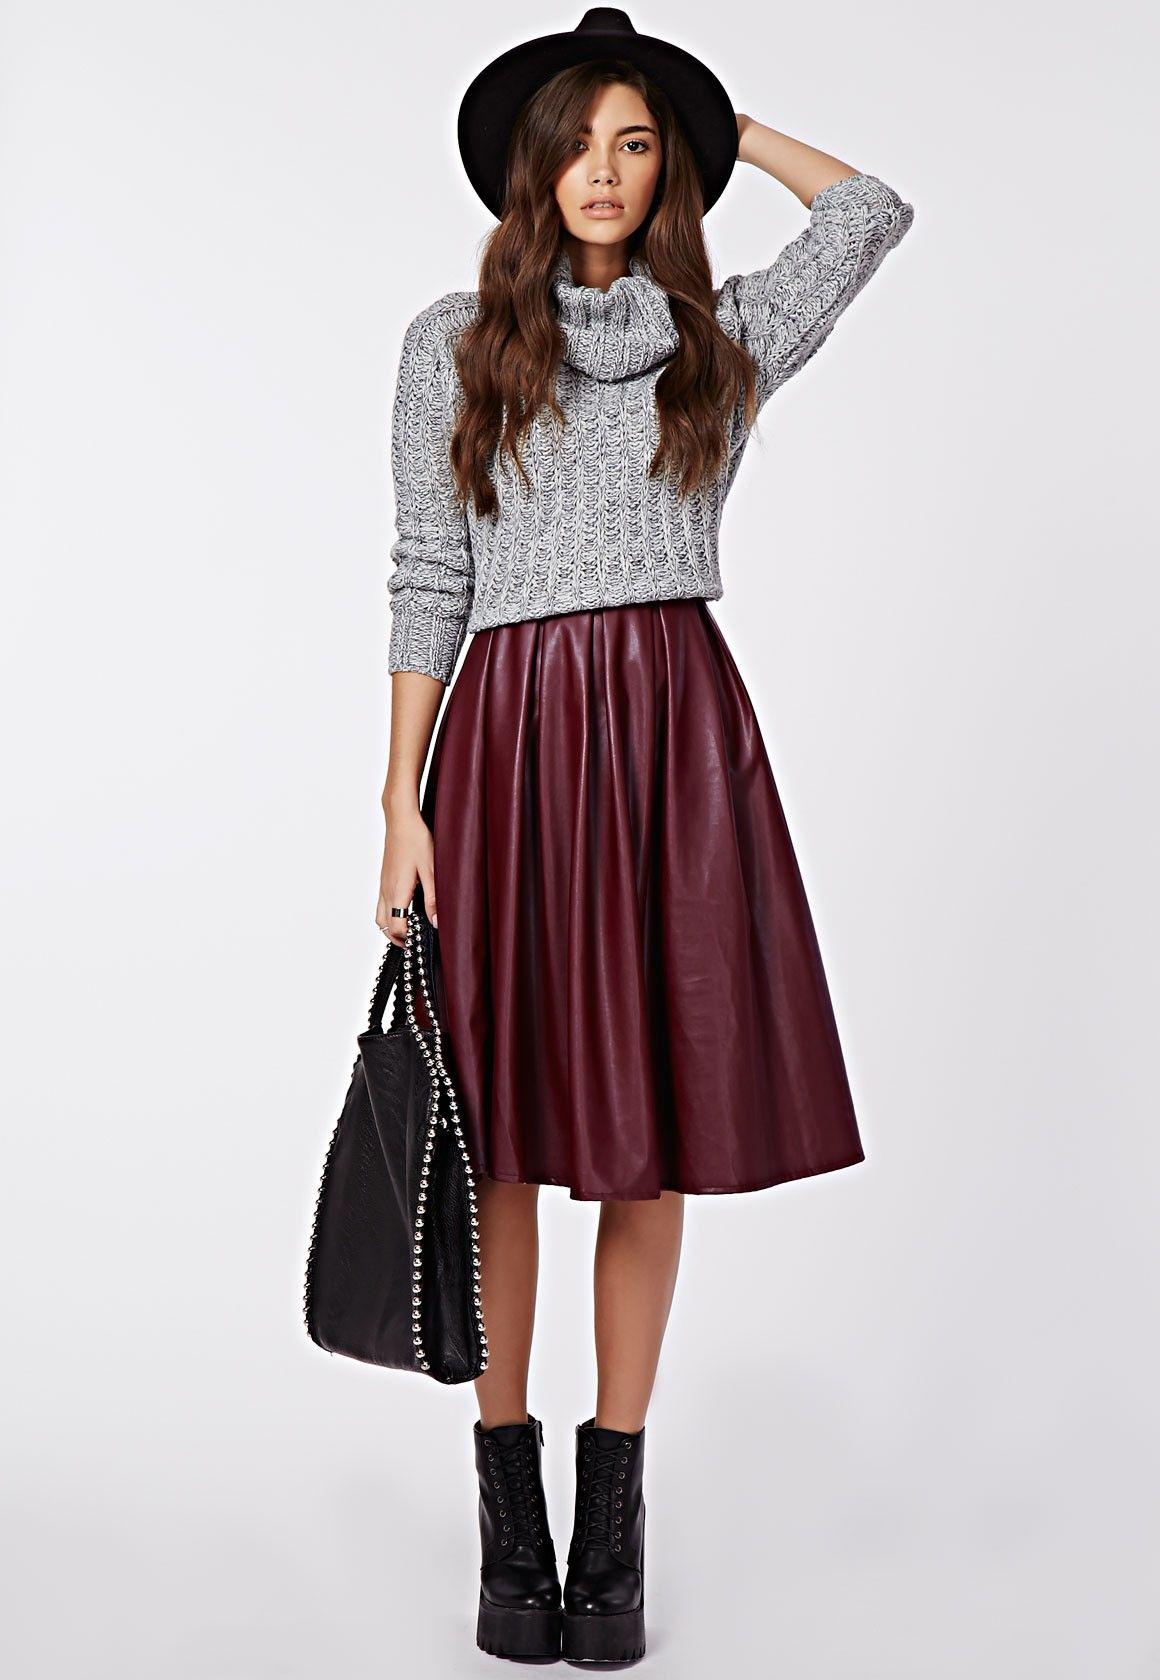 Rai Faux Leather Full Midi Skirt Burgundy Skirts Missguided Lgs Slim Fit Ladies Shirt Blue White Long Sleeve Gingham Biru Xl